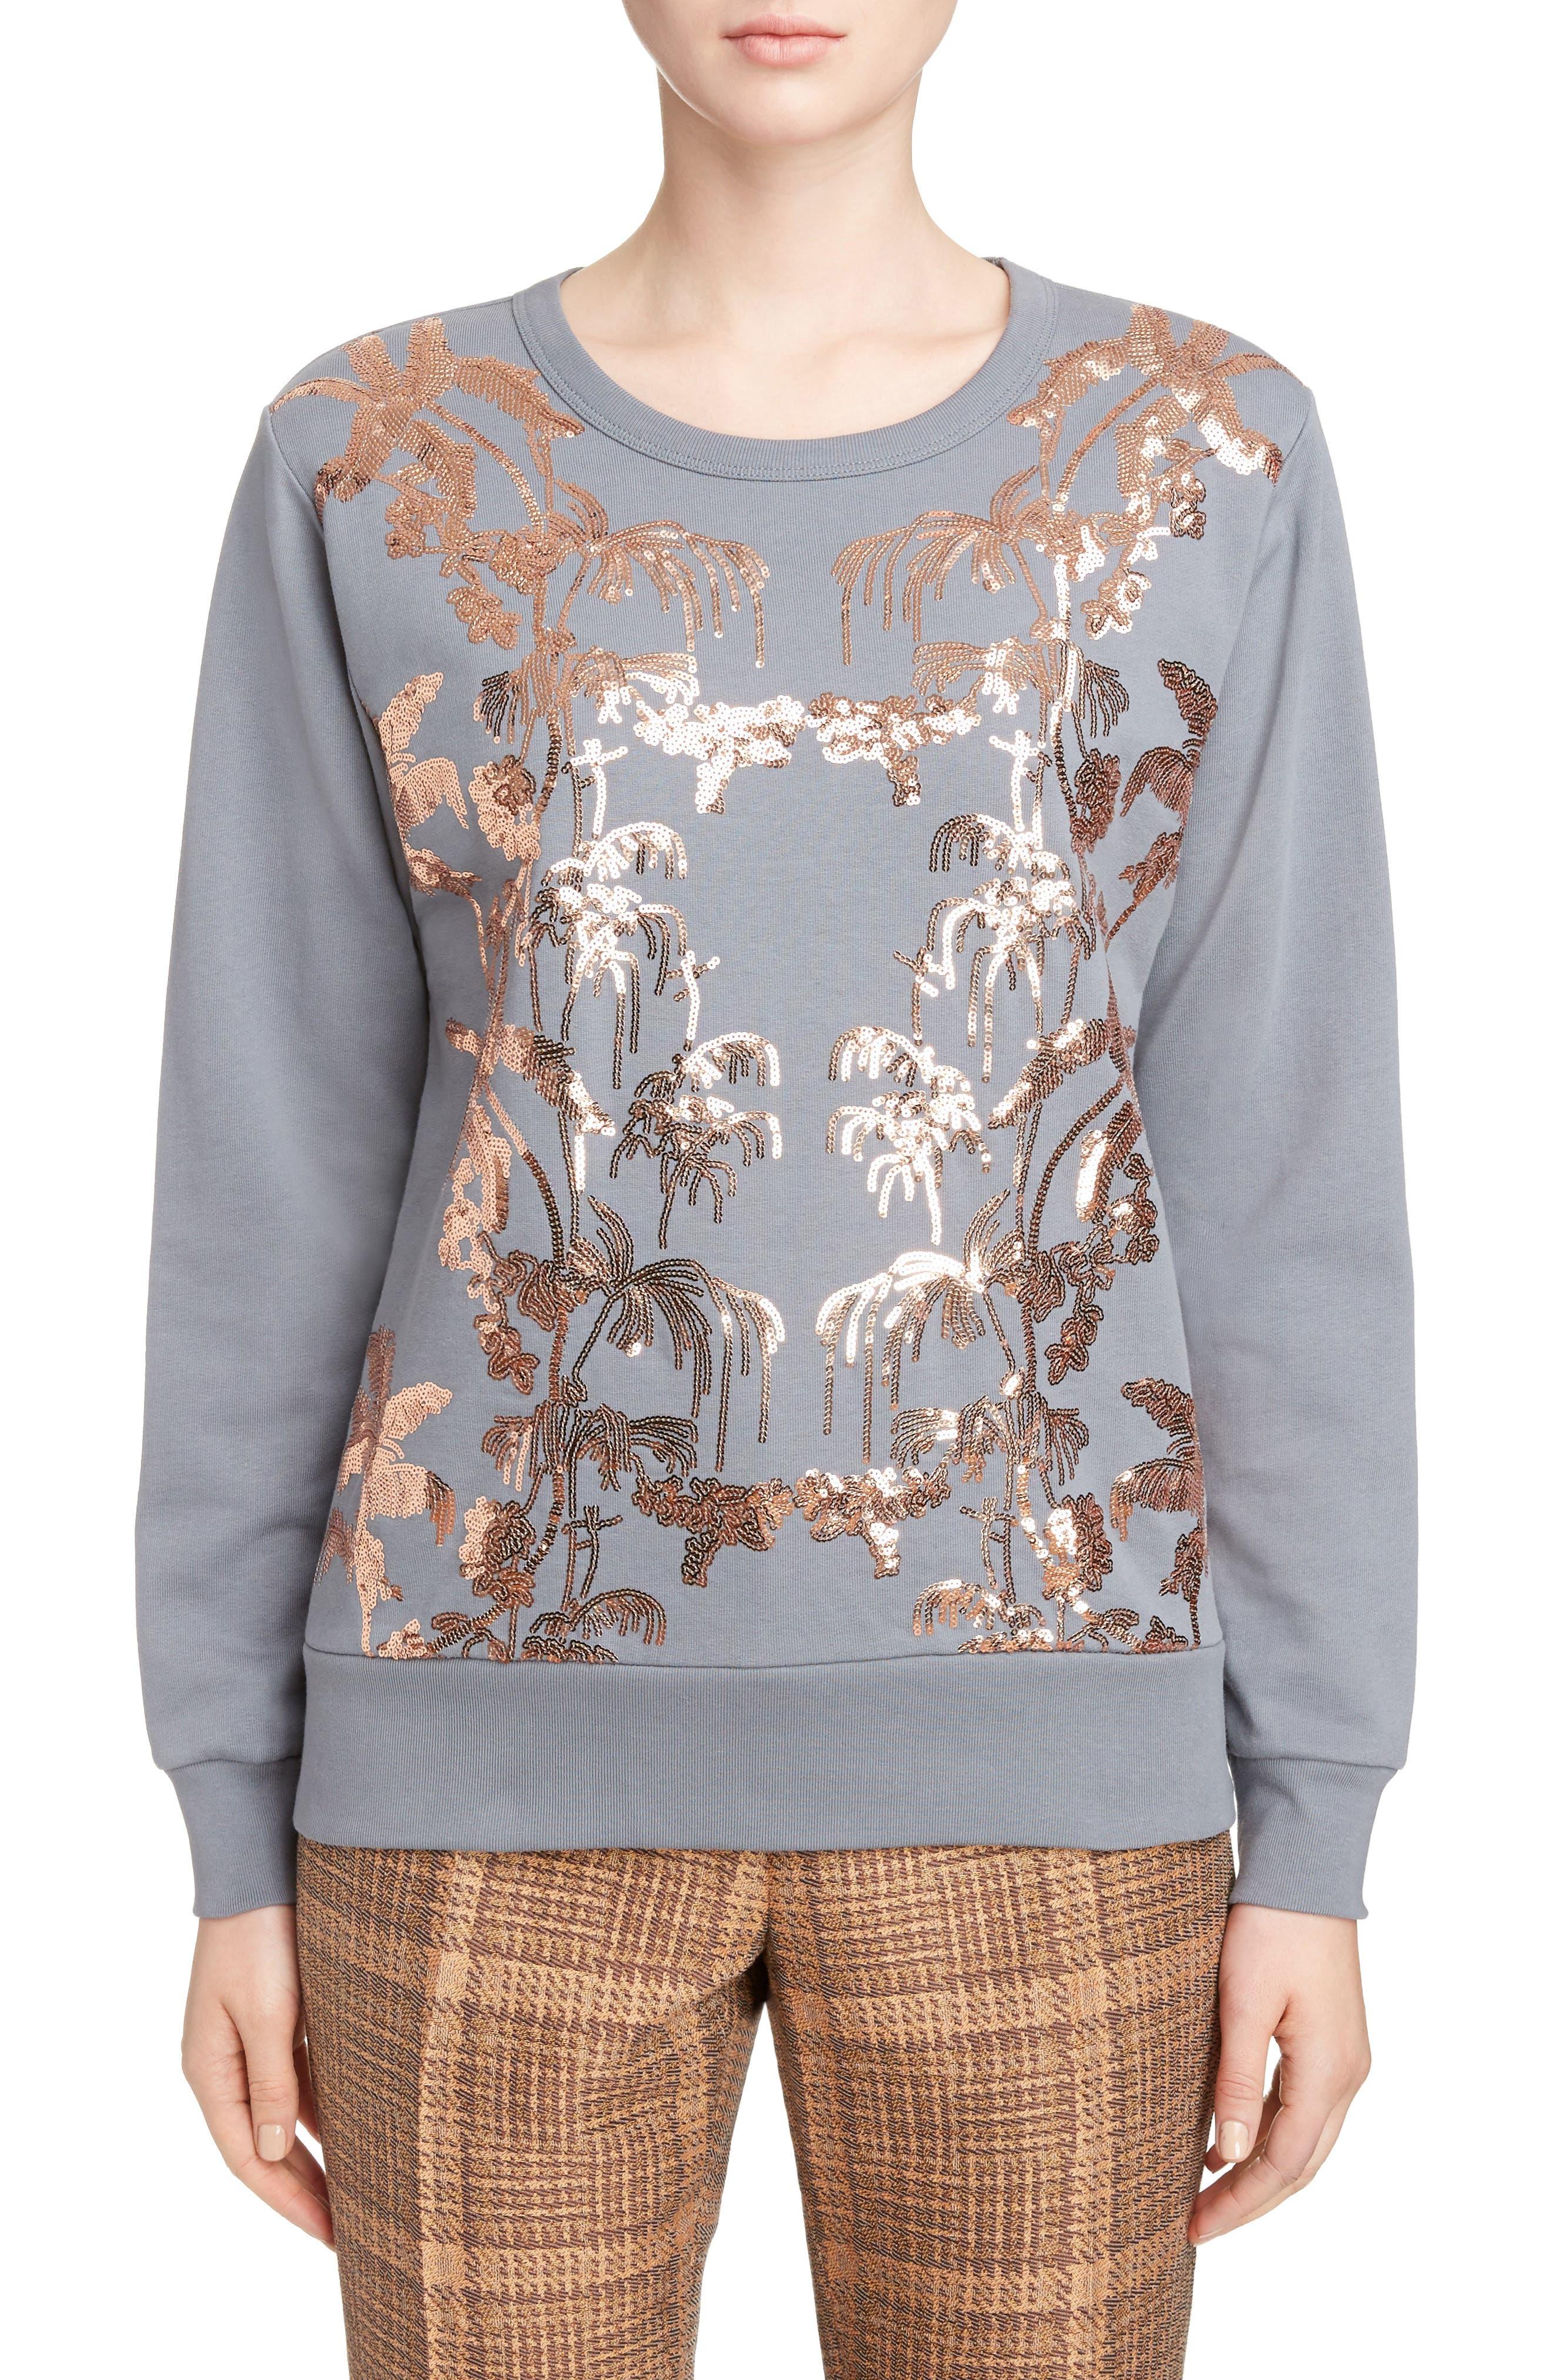 Sequin Embellished Sweatshirt,                             Main thumbnail 1, color,                             220